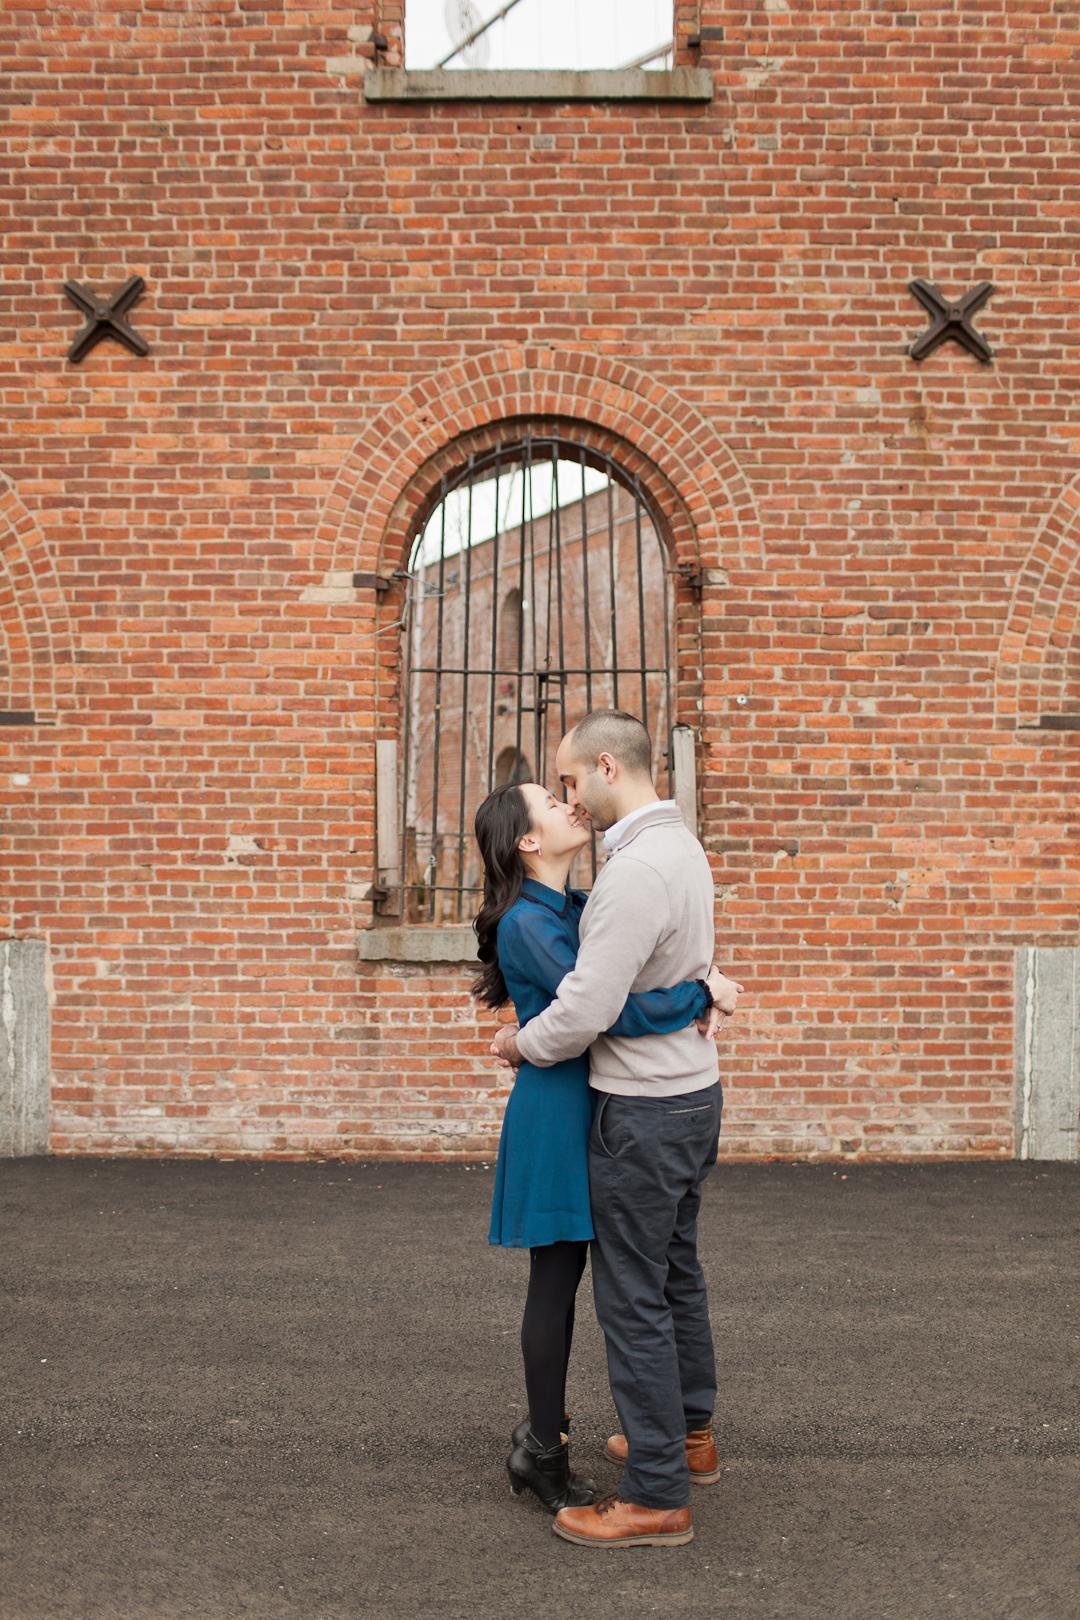 Melissa Kruse Photography - Kristine & David Engagement Photos-67.jpg